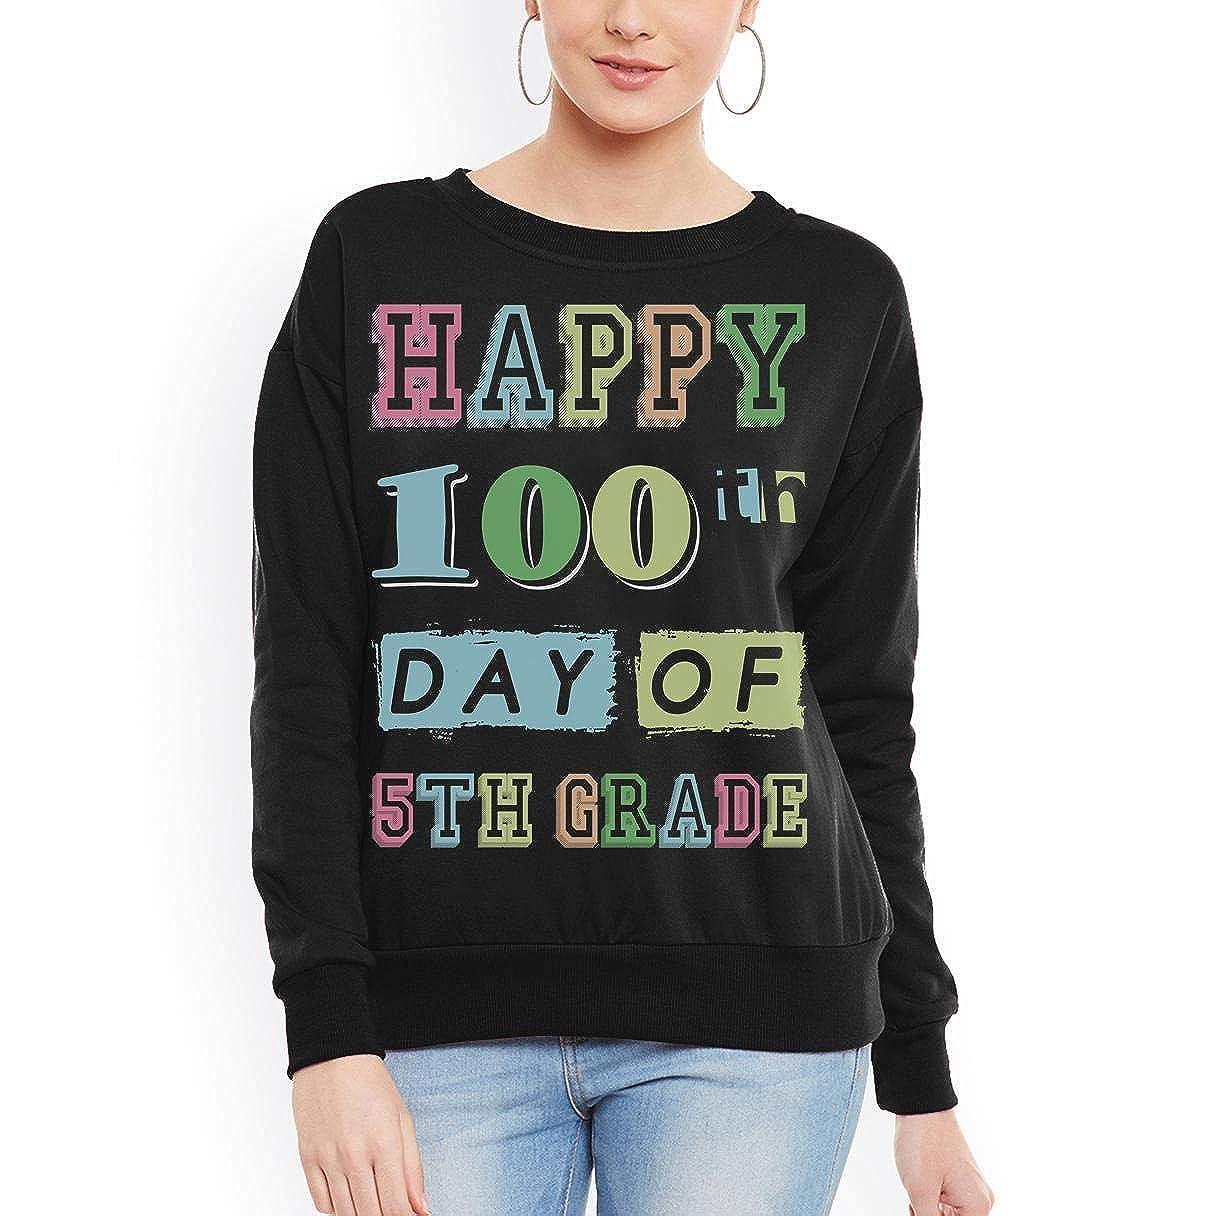 Happy 100th Day of School 5th Grade Teacher Student Unisex Sweatshirt tee